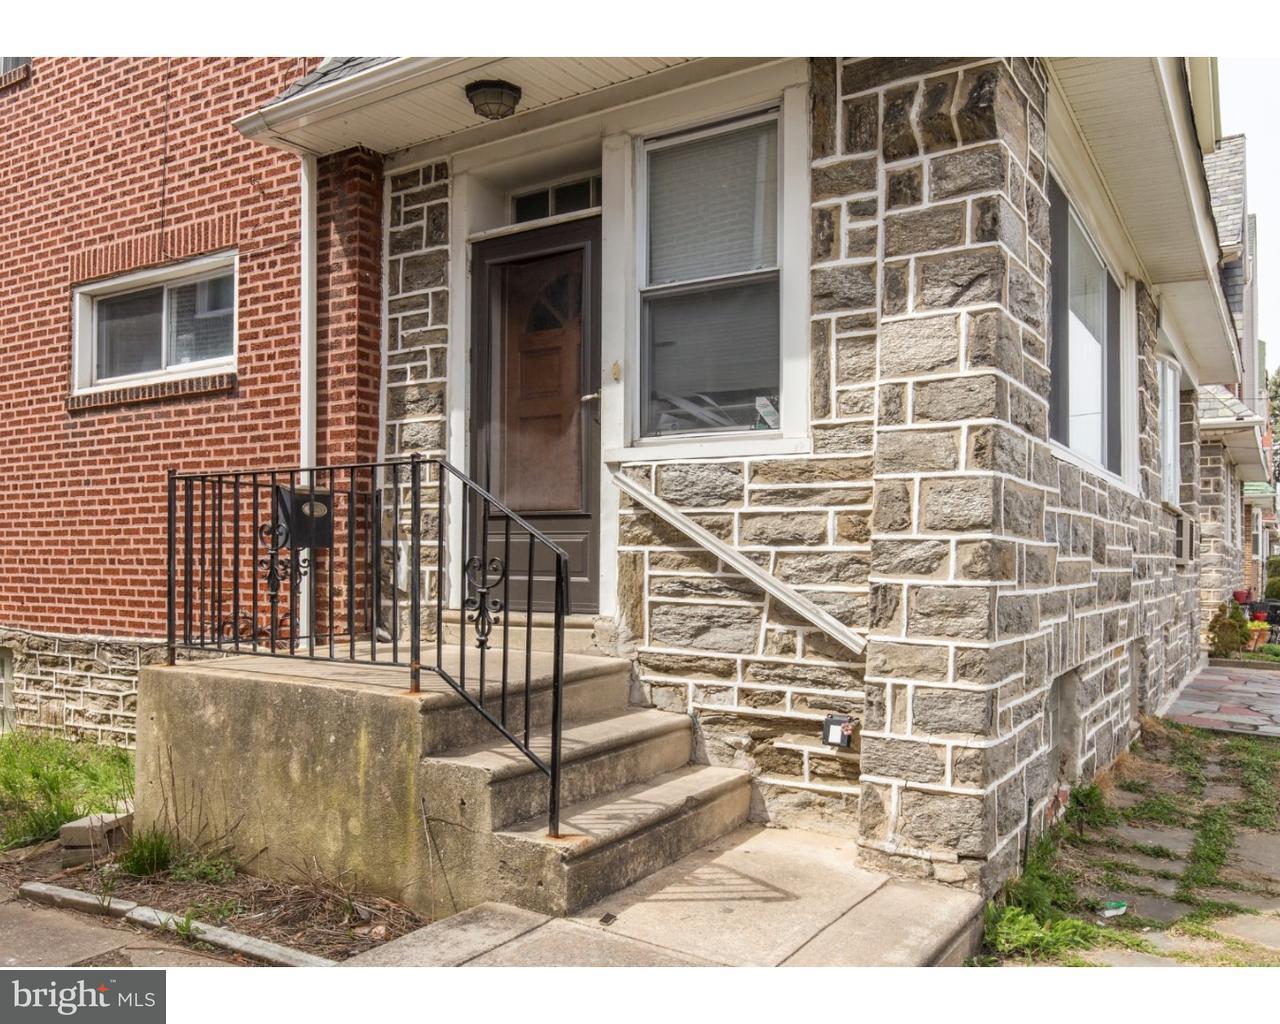 826 FERN ST, YEADON - Listed at $154,900, YEADON